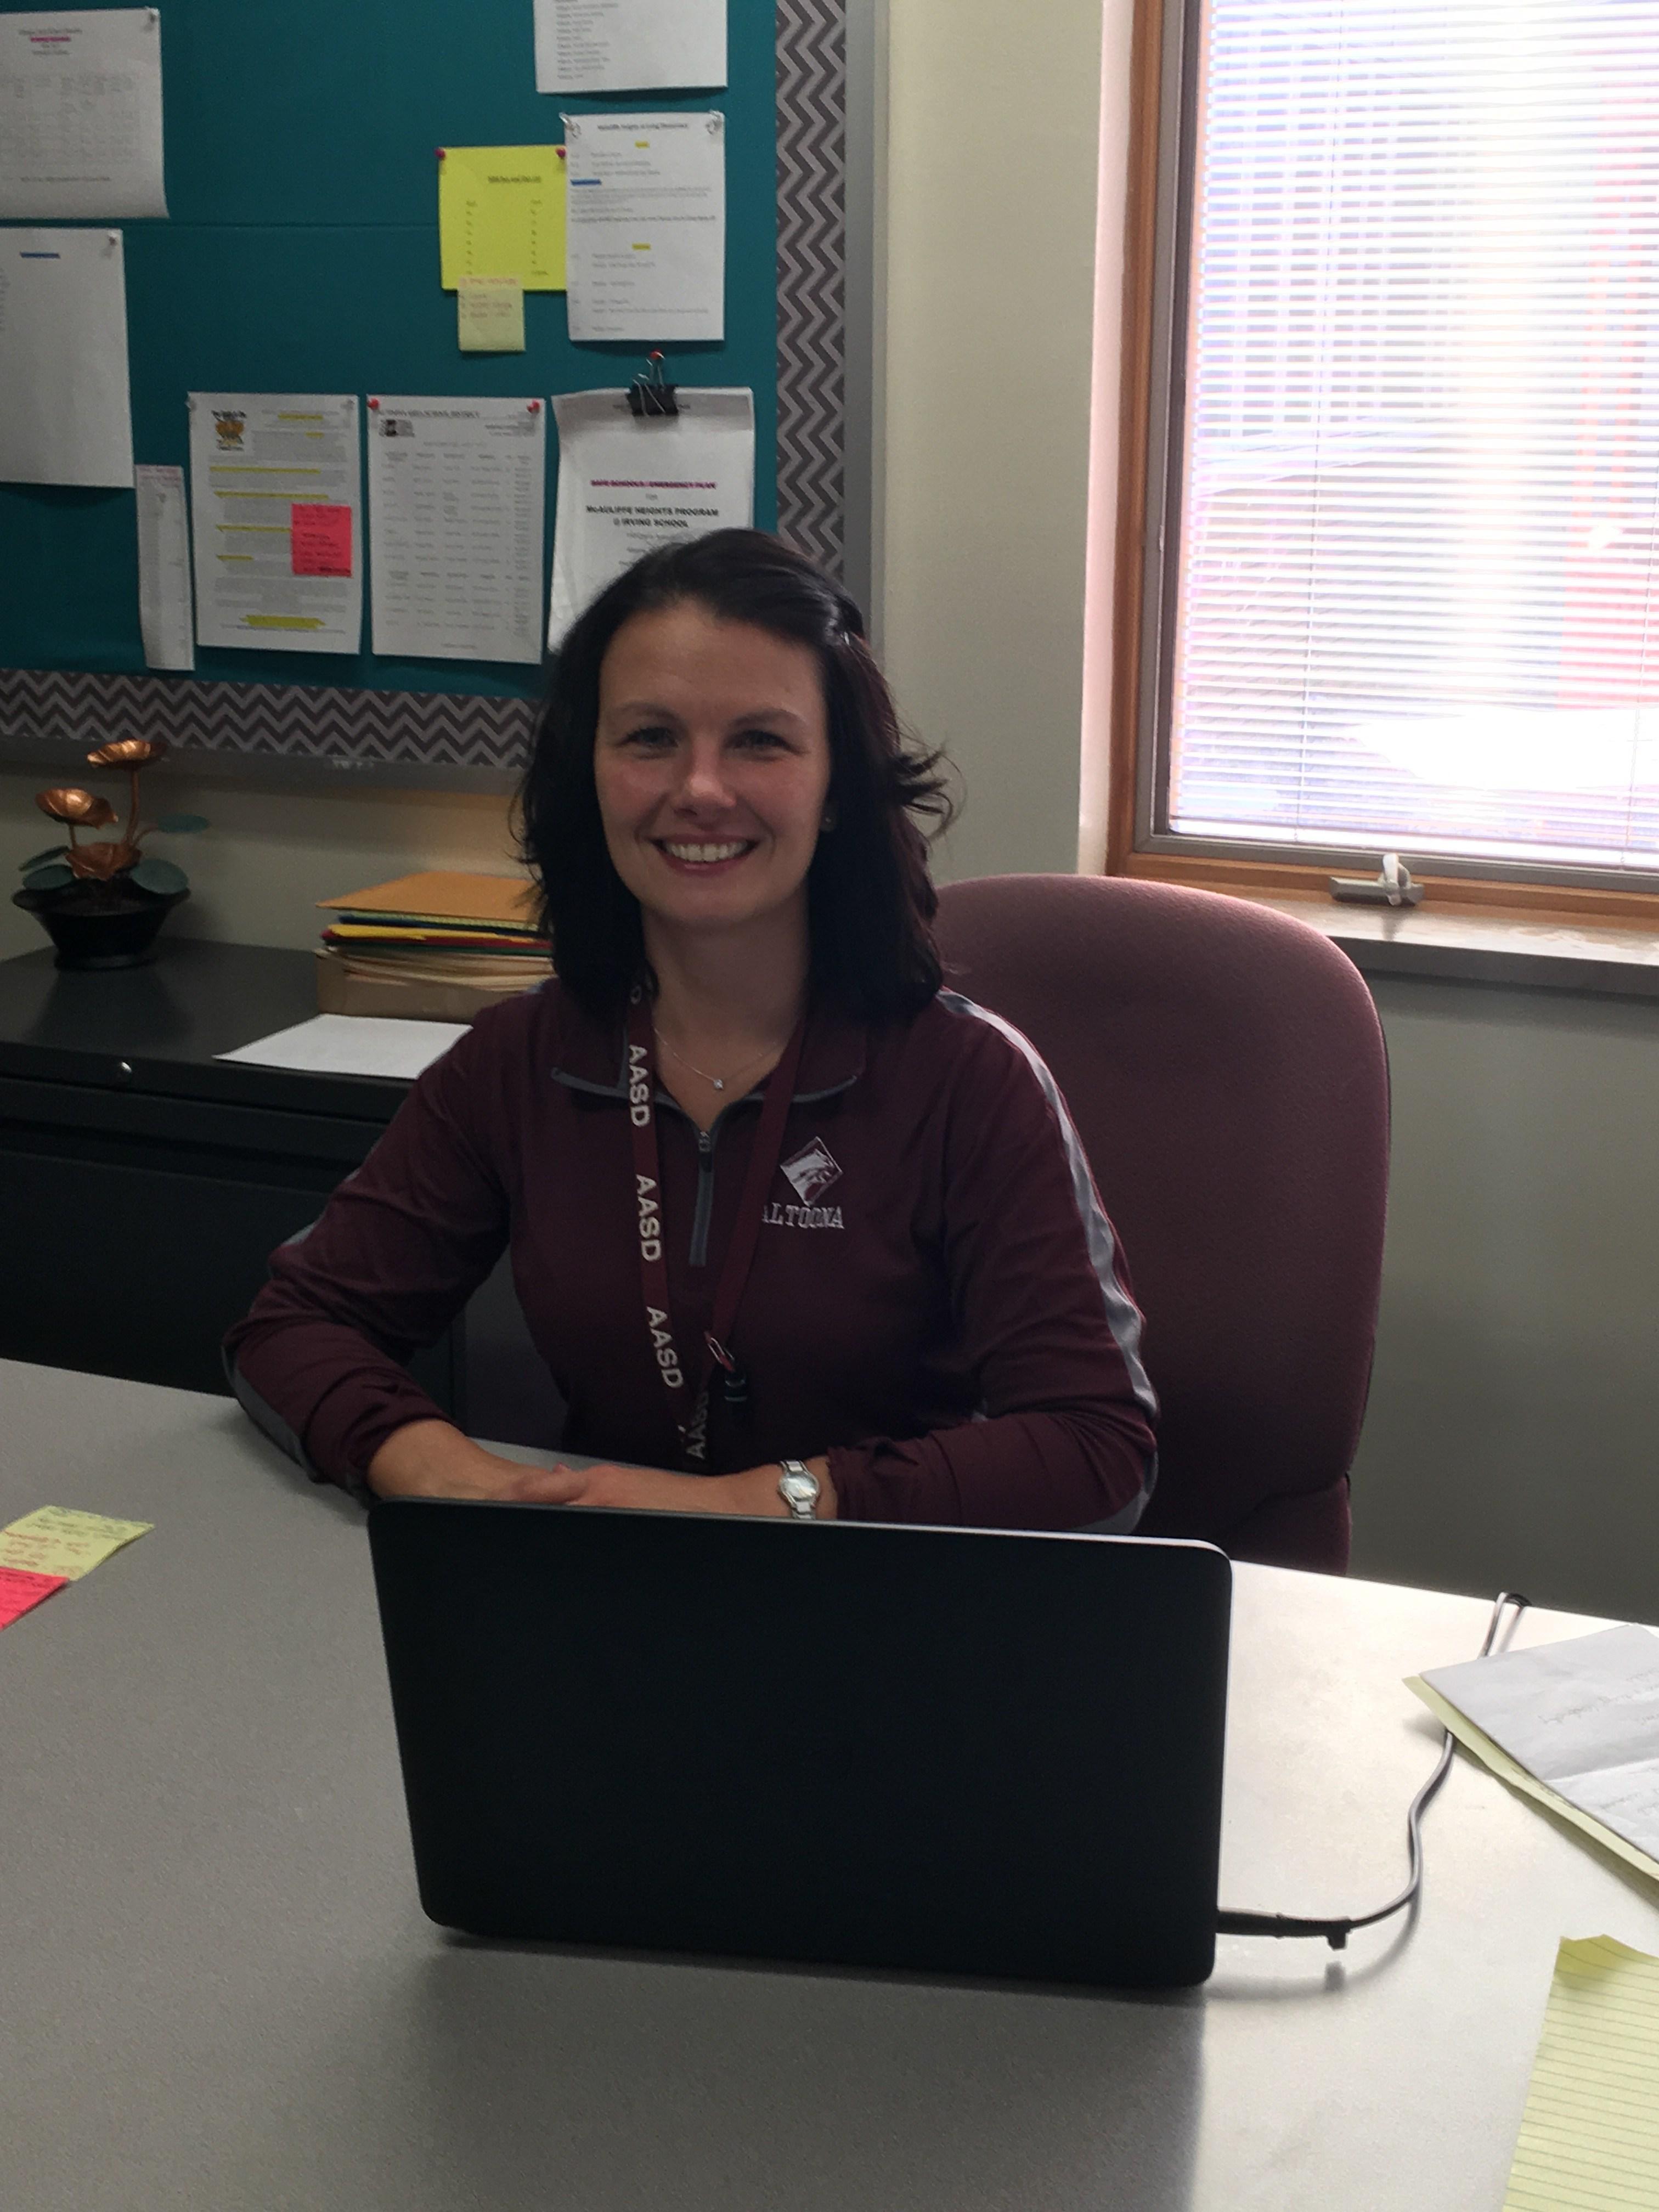 Mrs. Agnew, Principal